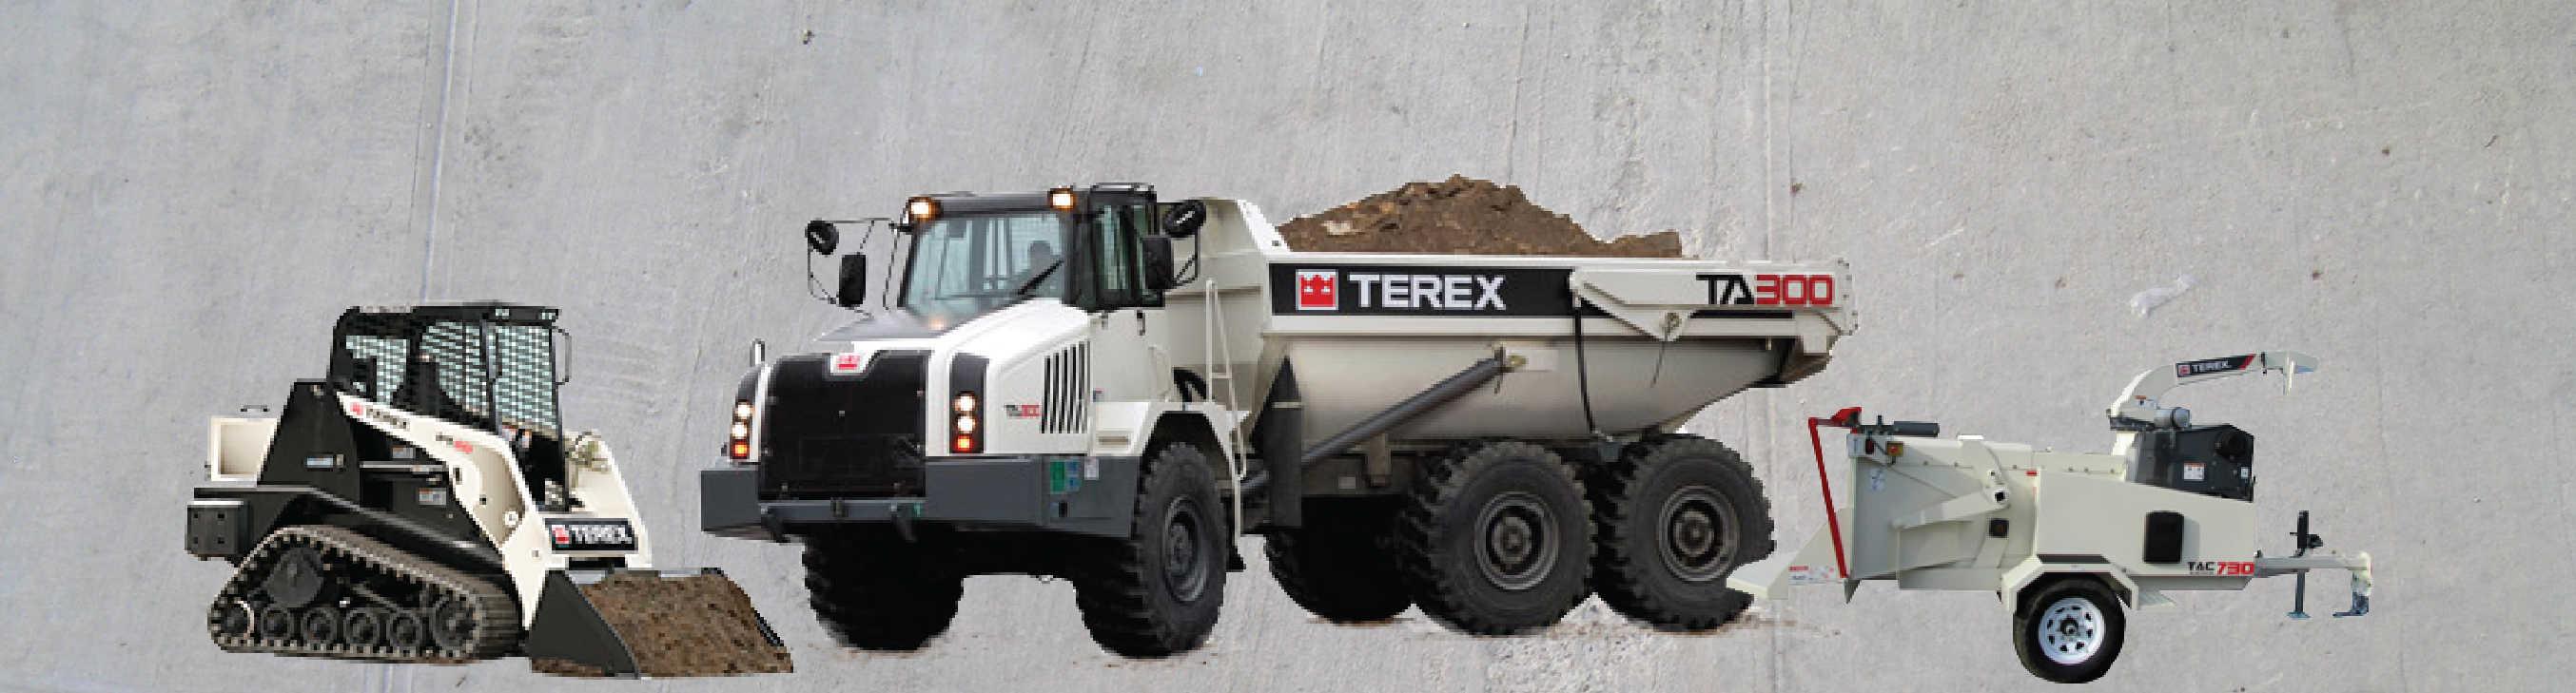 Terex Construction